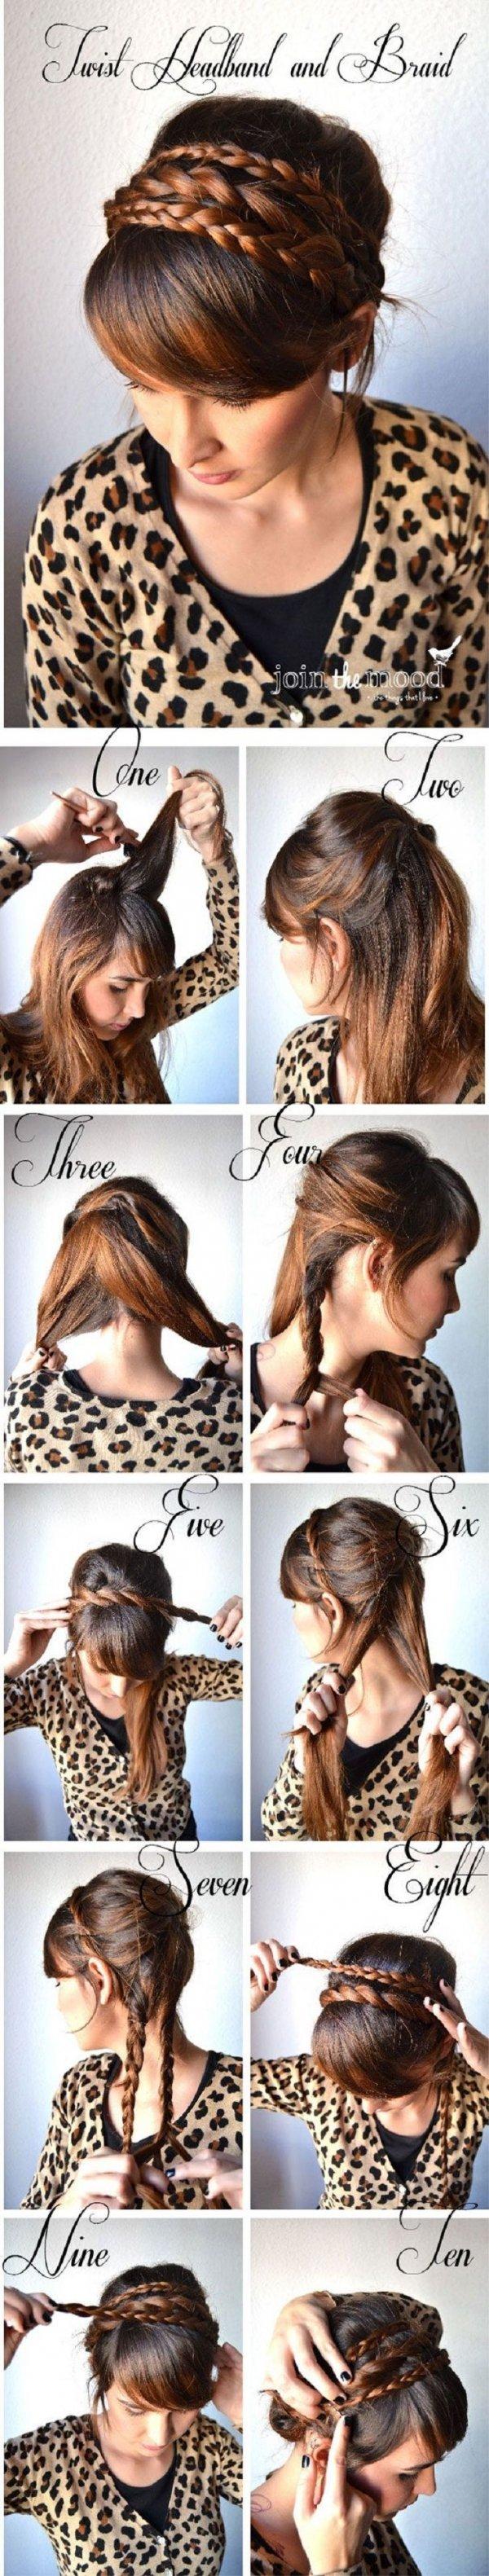 hair,hairstyle,moustache,brand,sense,